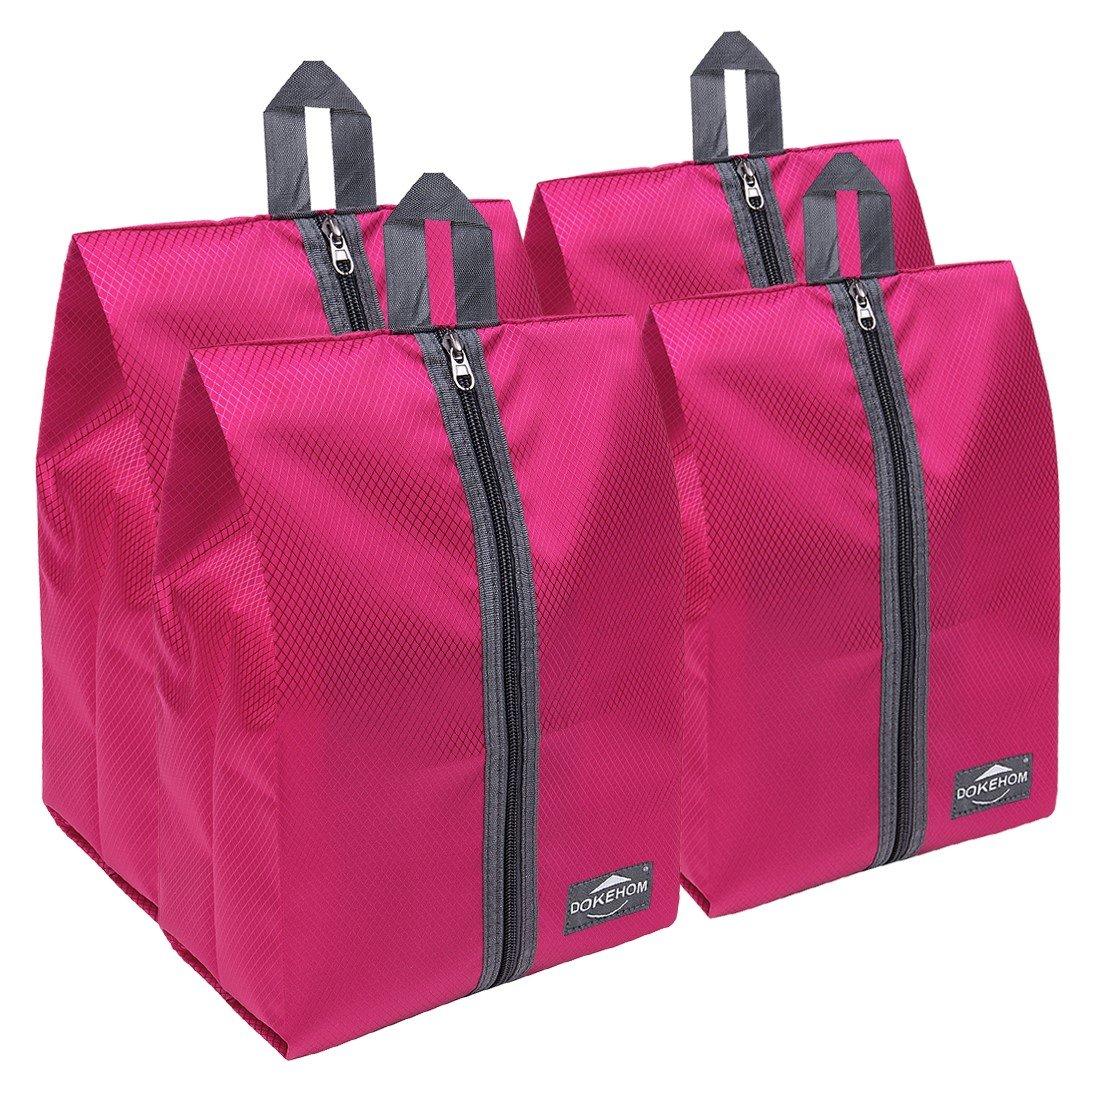 DOKEHOM DKA3030DPG1 Portable Nylon Travel Shoe Storage Organizer Bag (8 Colors) with Zipper Closure (Pack 4, Dark Pink) by DOKEHOM (Image #1)